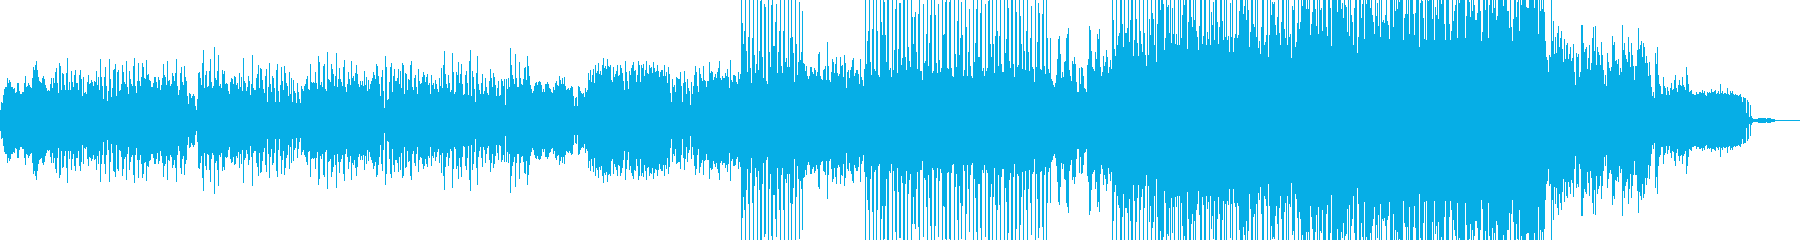 Yuugure-学校の帰り道の再生済みの波形